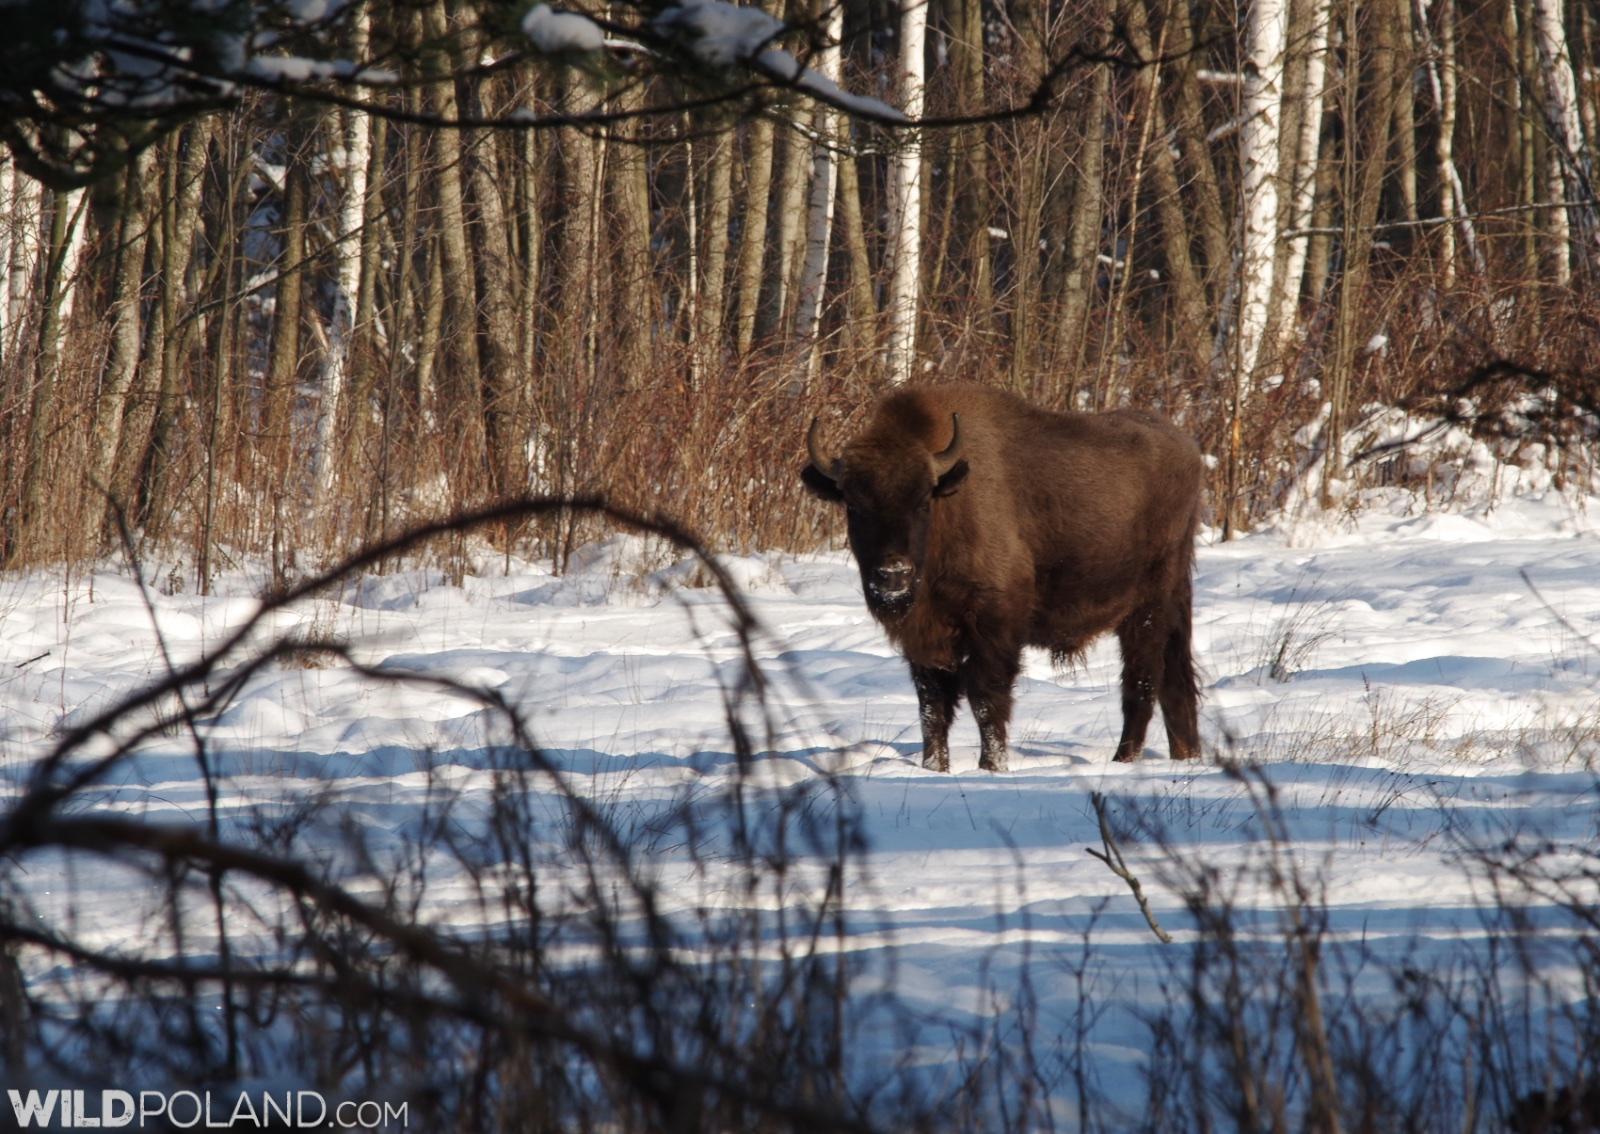 Winter Bison Safari & Wolf Tracking Trip Report – Jan 2016